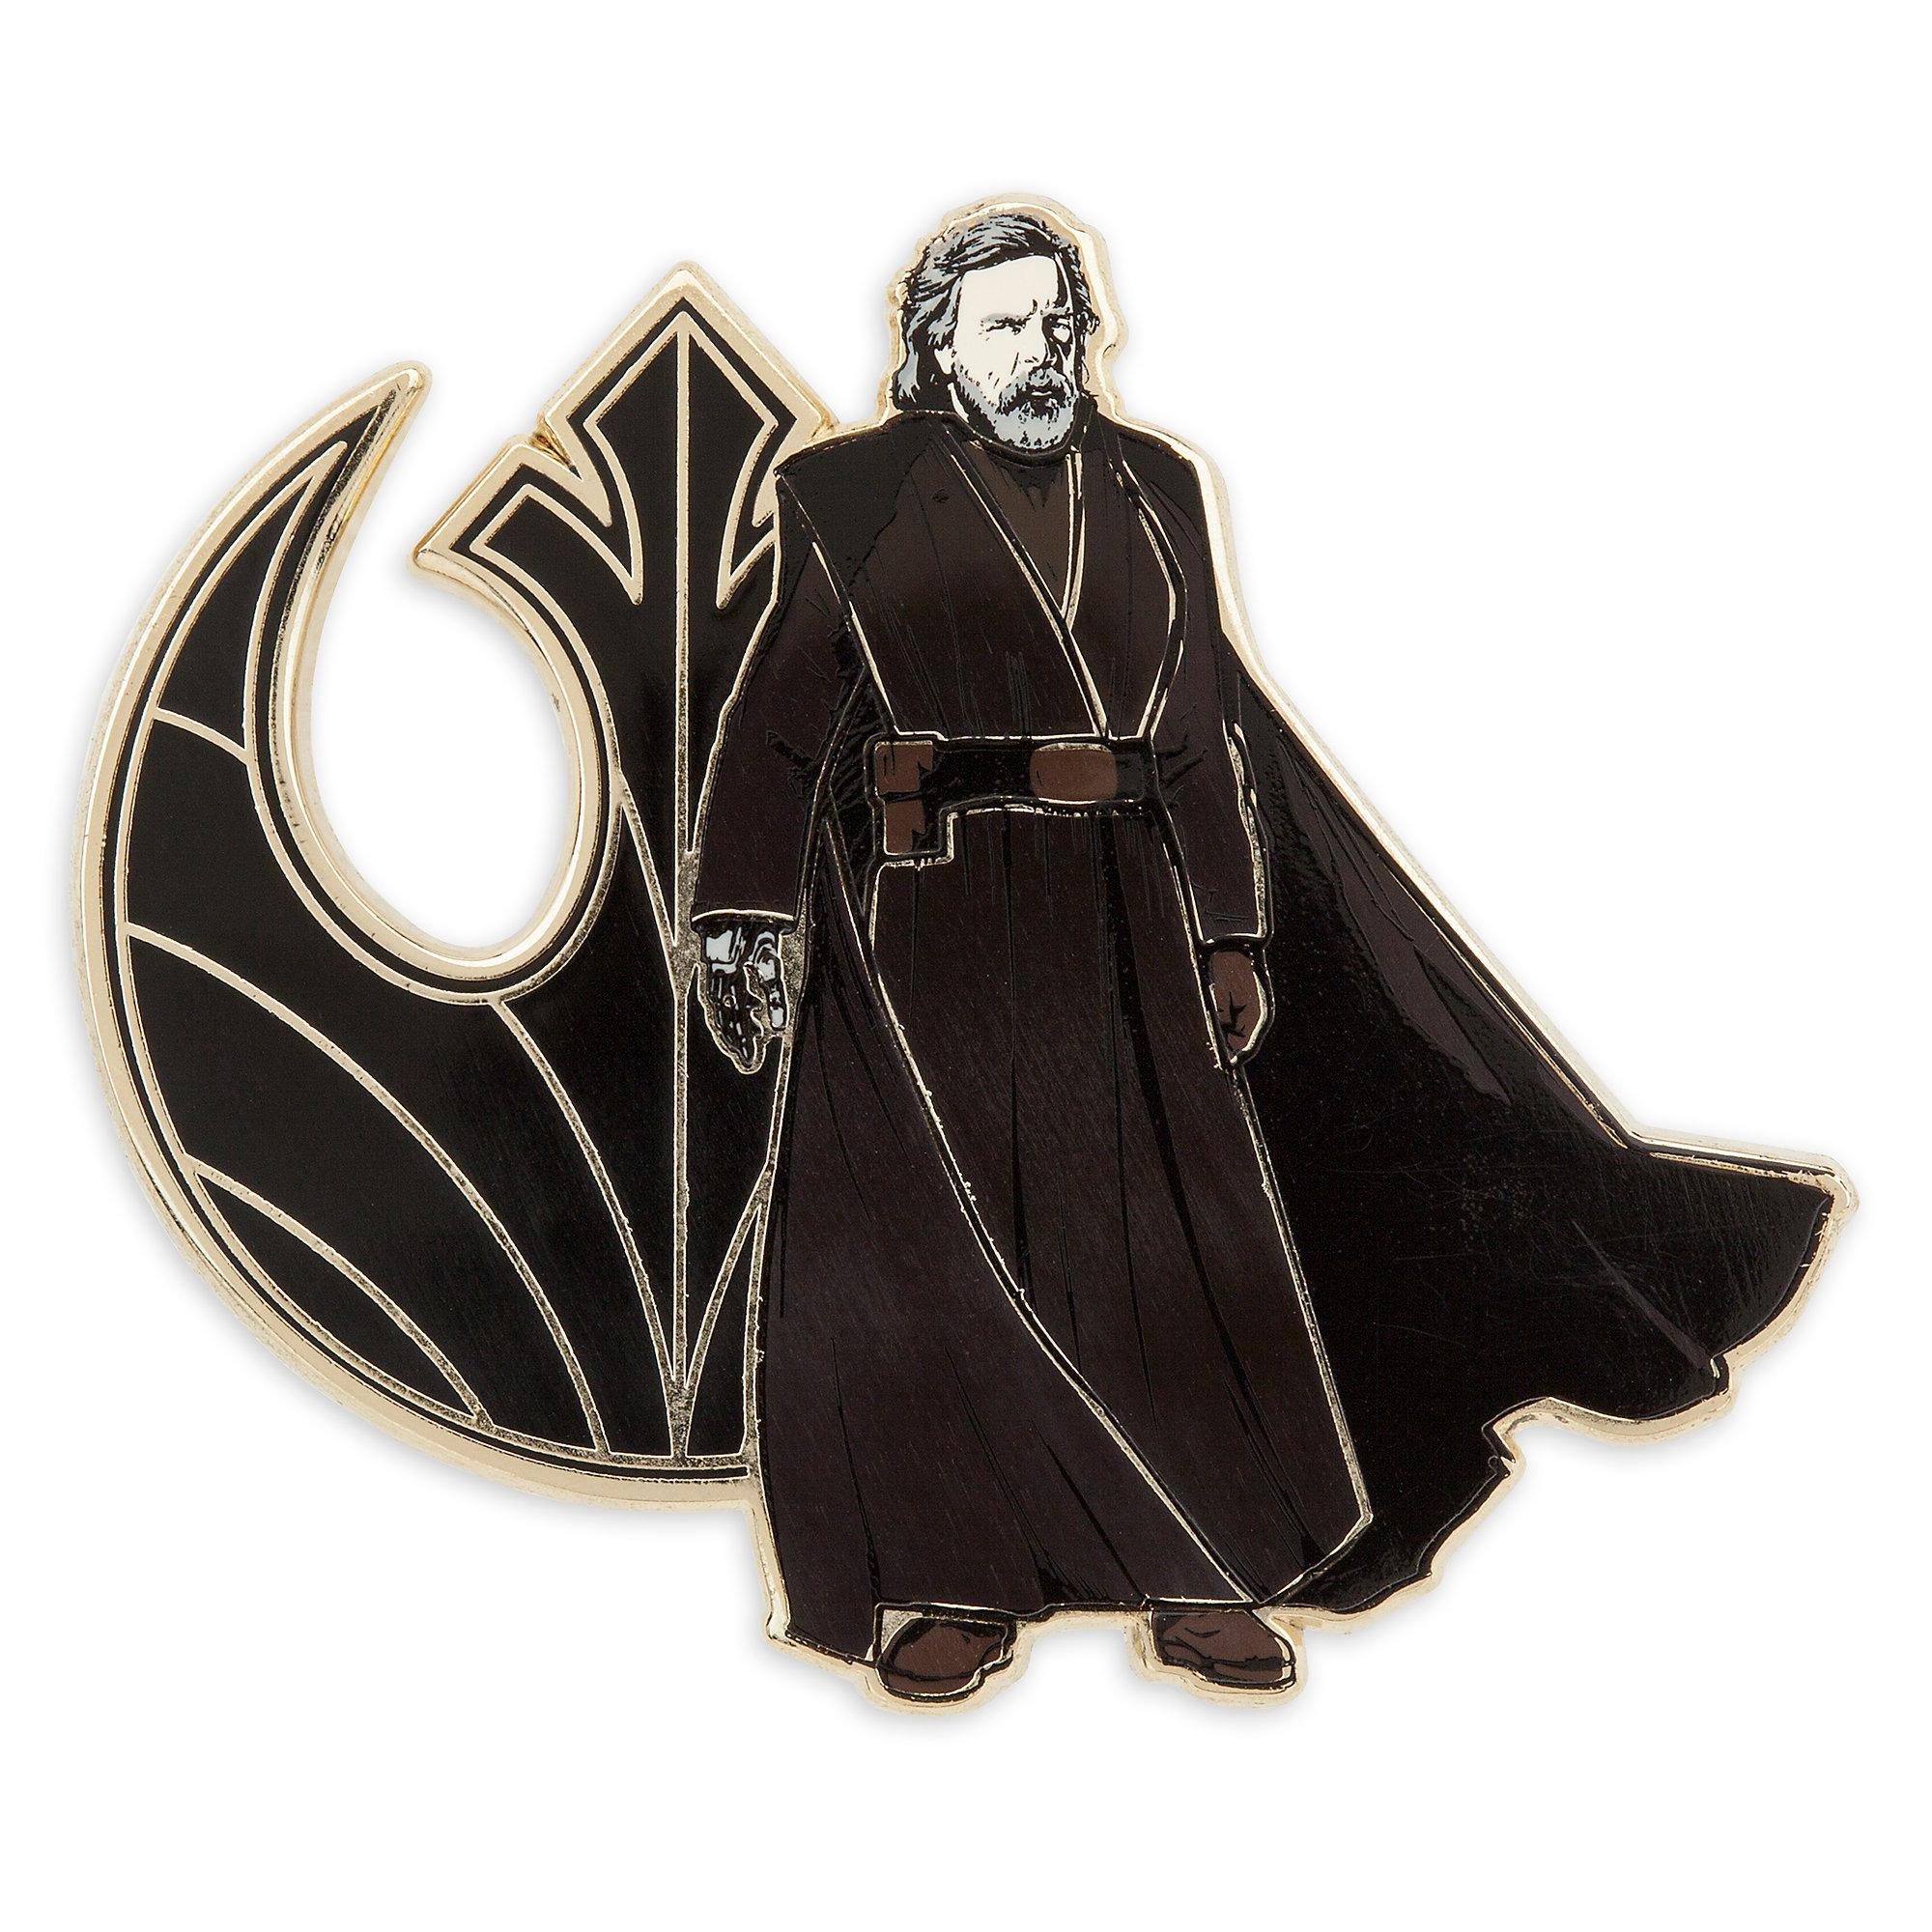 TLJ Luke Skywalker Pin & Lithograph Set 2